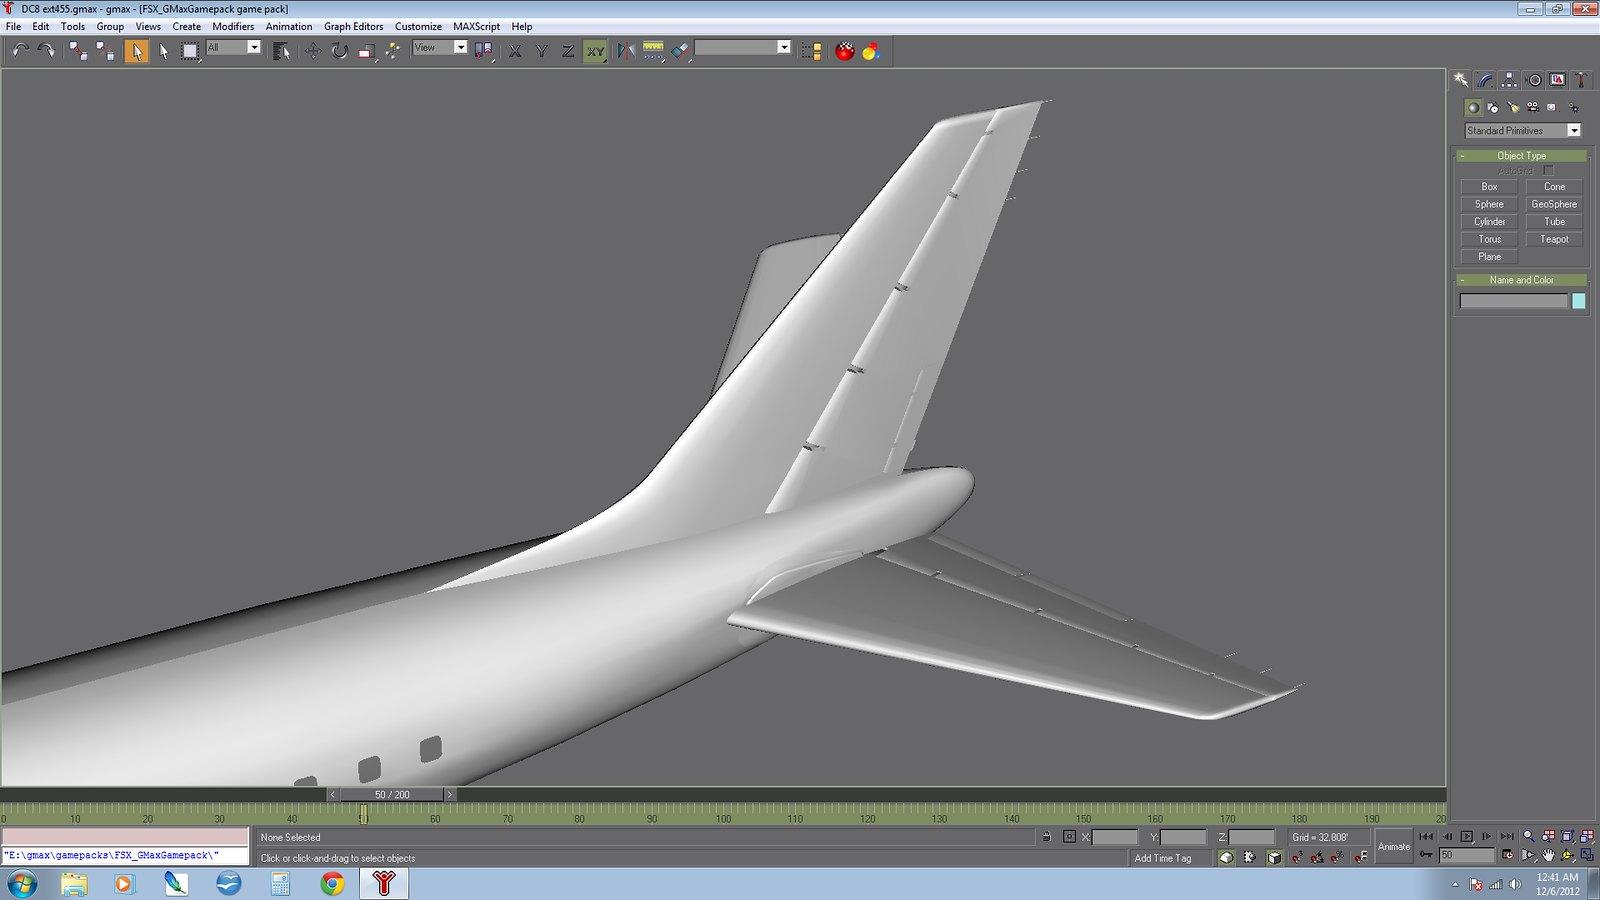 FSX - DC-8 50 series update | FSDeveloper